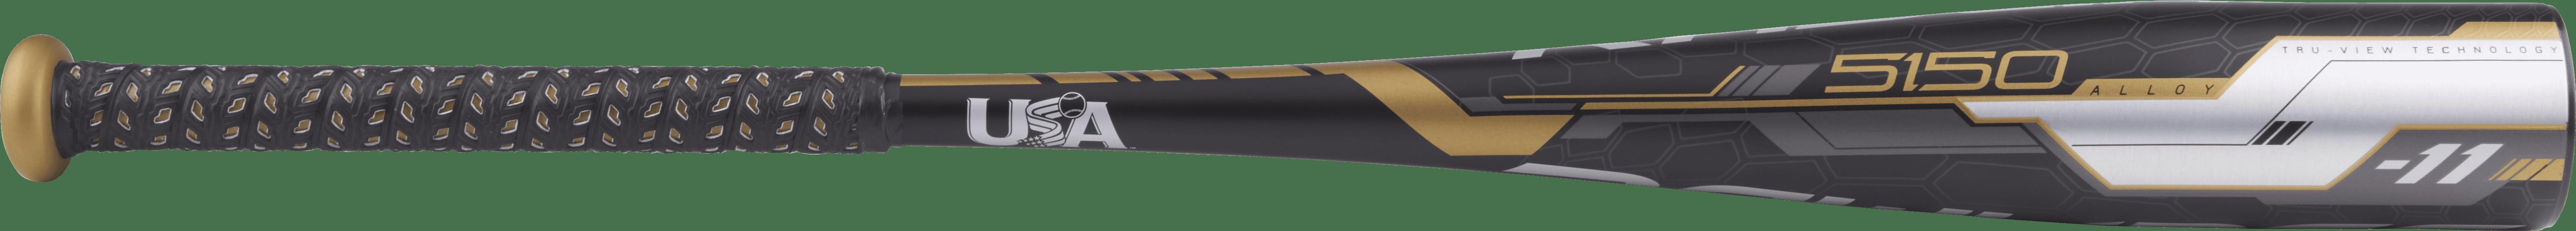 Rawlings 5150 Alloy USA Baseball Bat, 2-5 8-Inch Big Barrel, 29-Inch Length, -11 Drop Weight, 18 Ounces by Rawlings